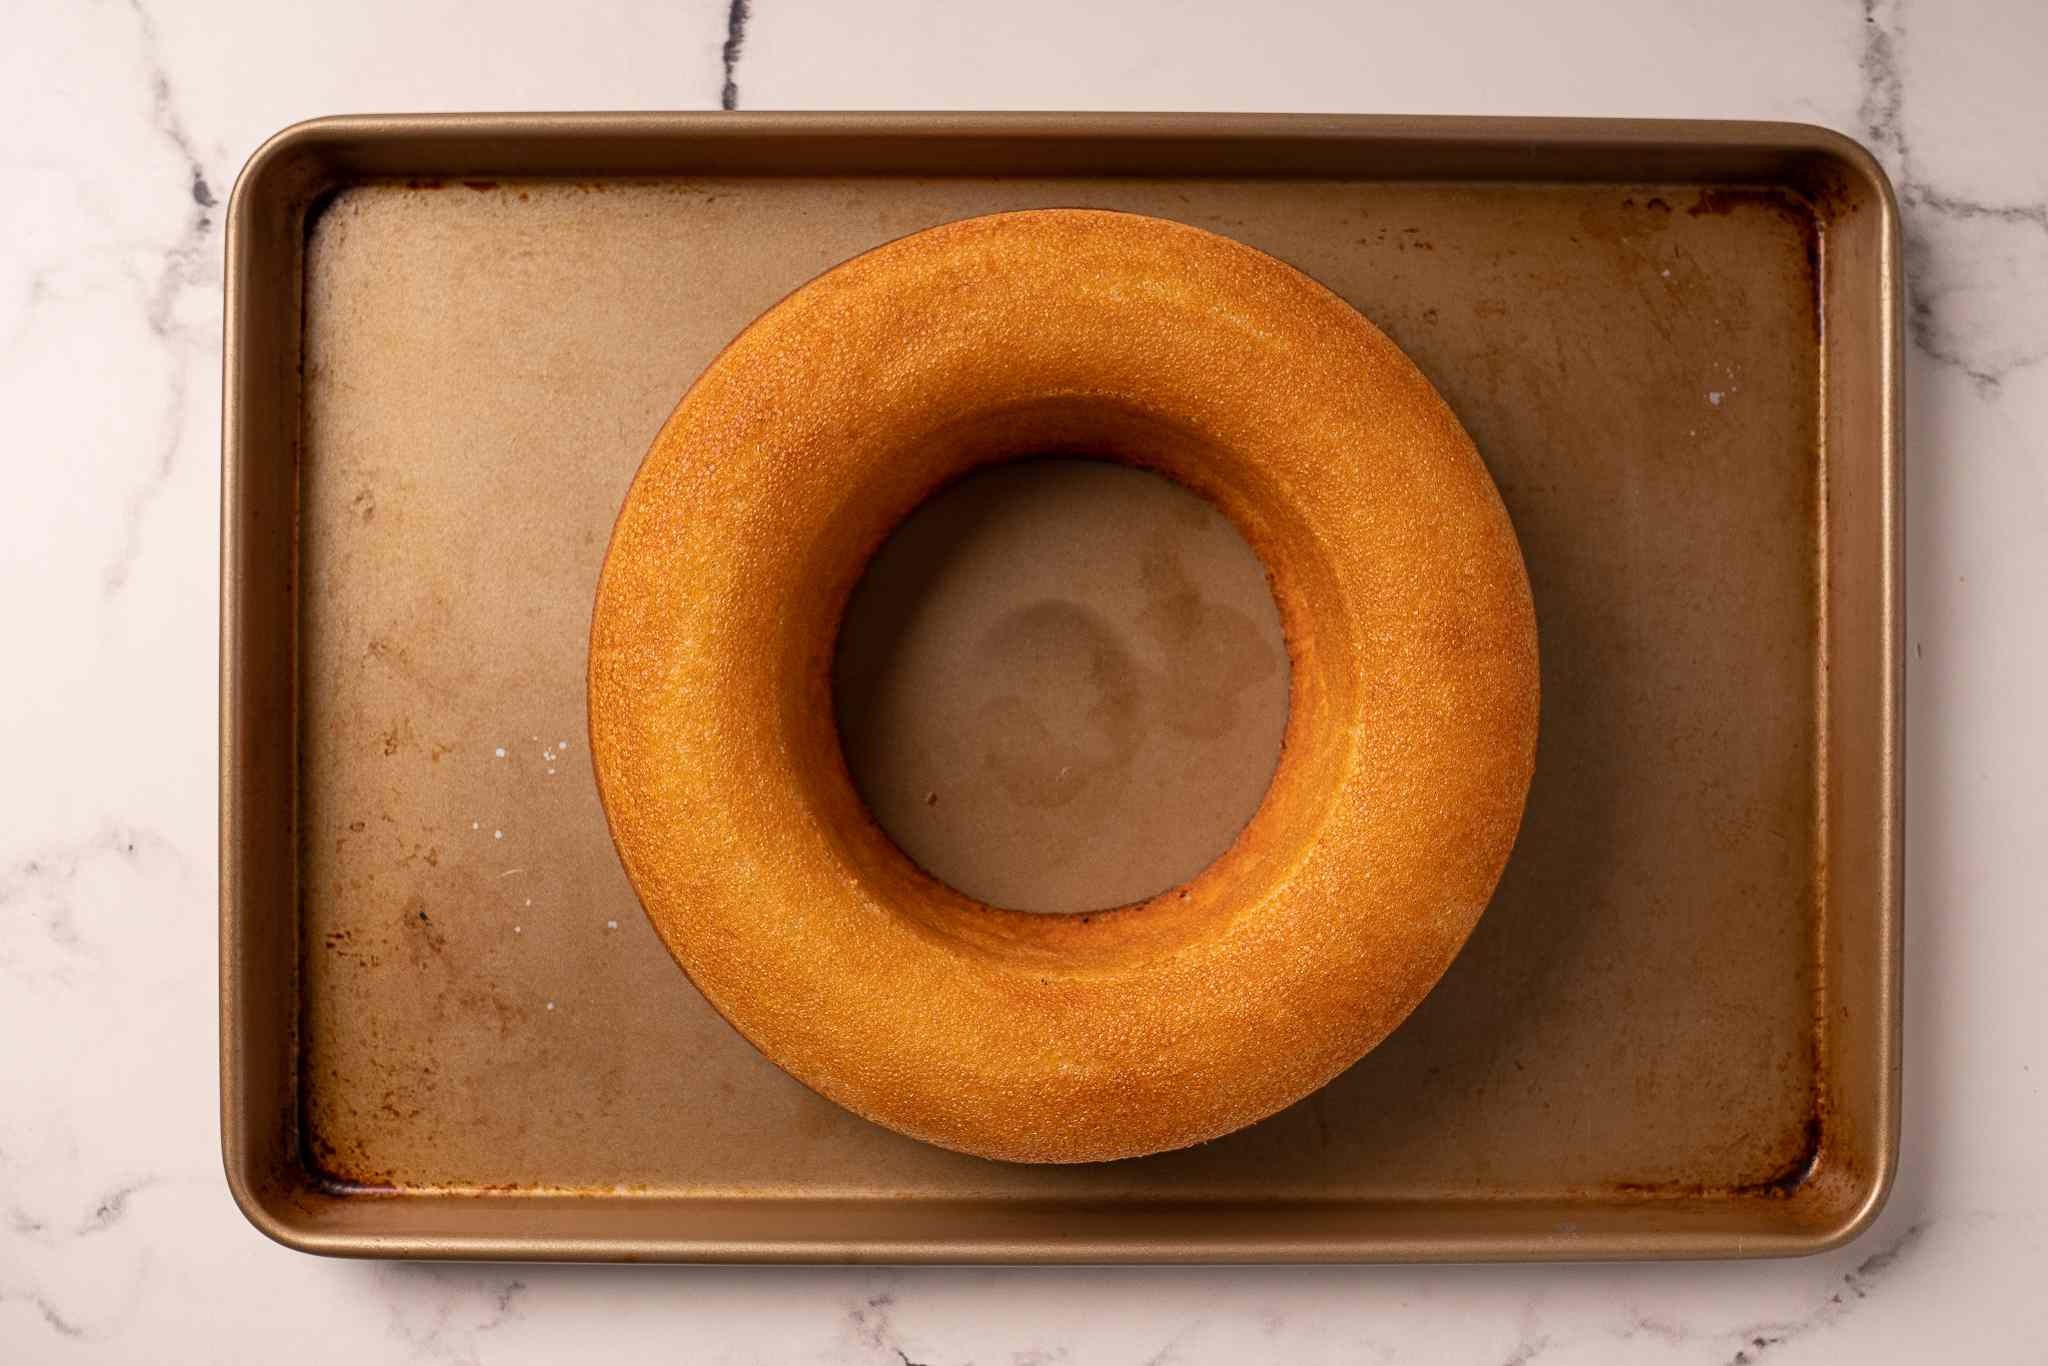 Baked savarin on a baking sheet